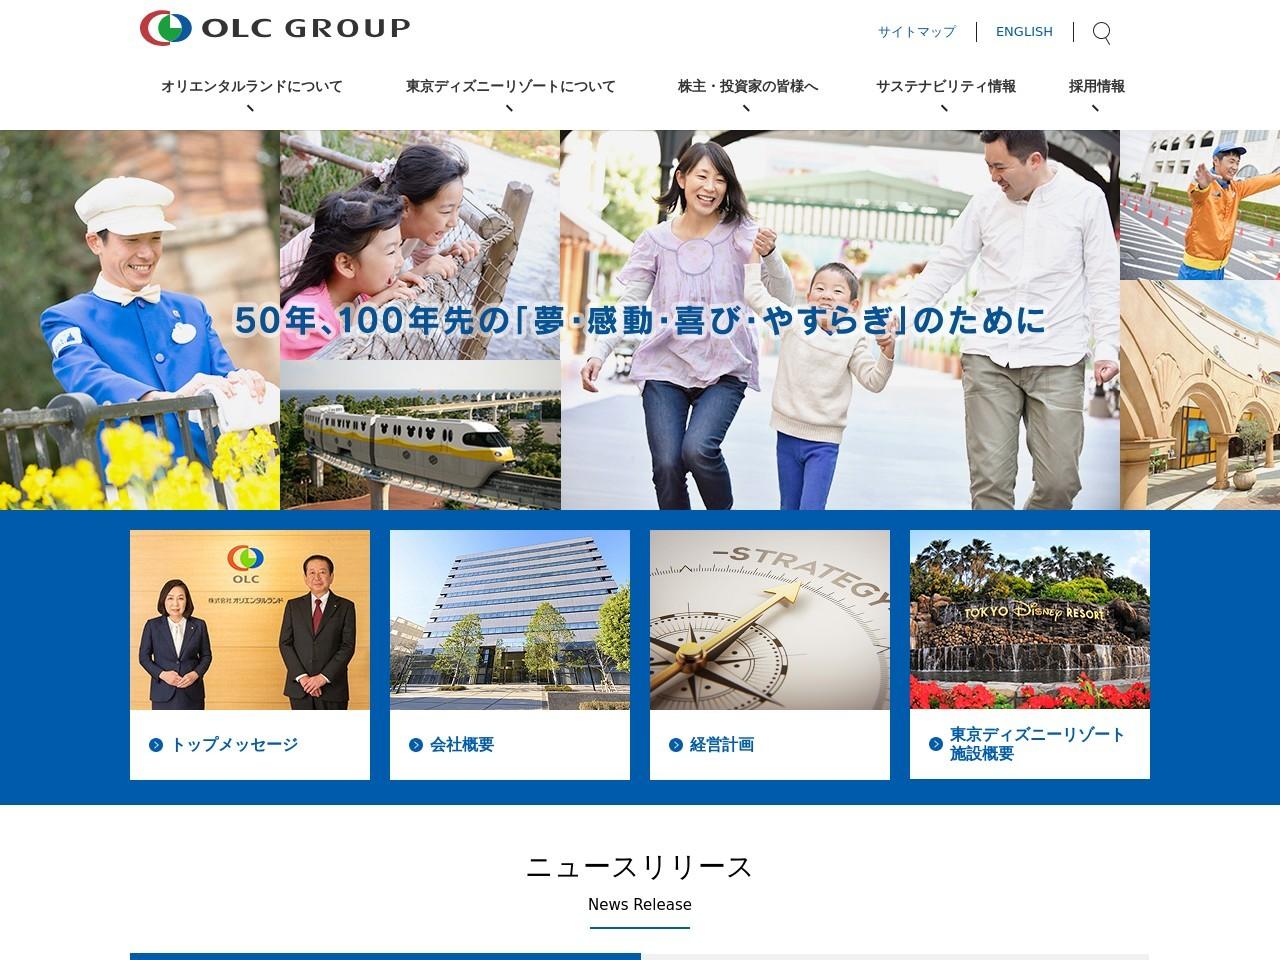 http://www.olc.co.jp/news/tdr/20140325_02.pdf